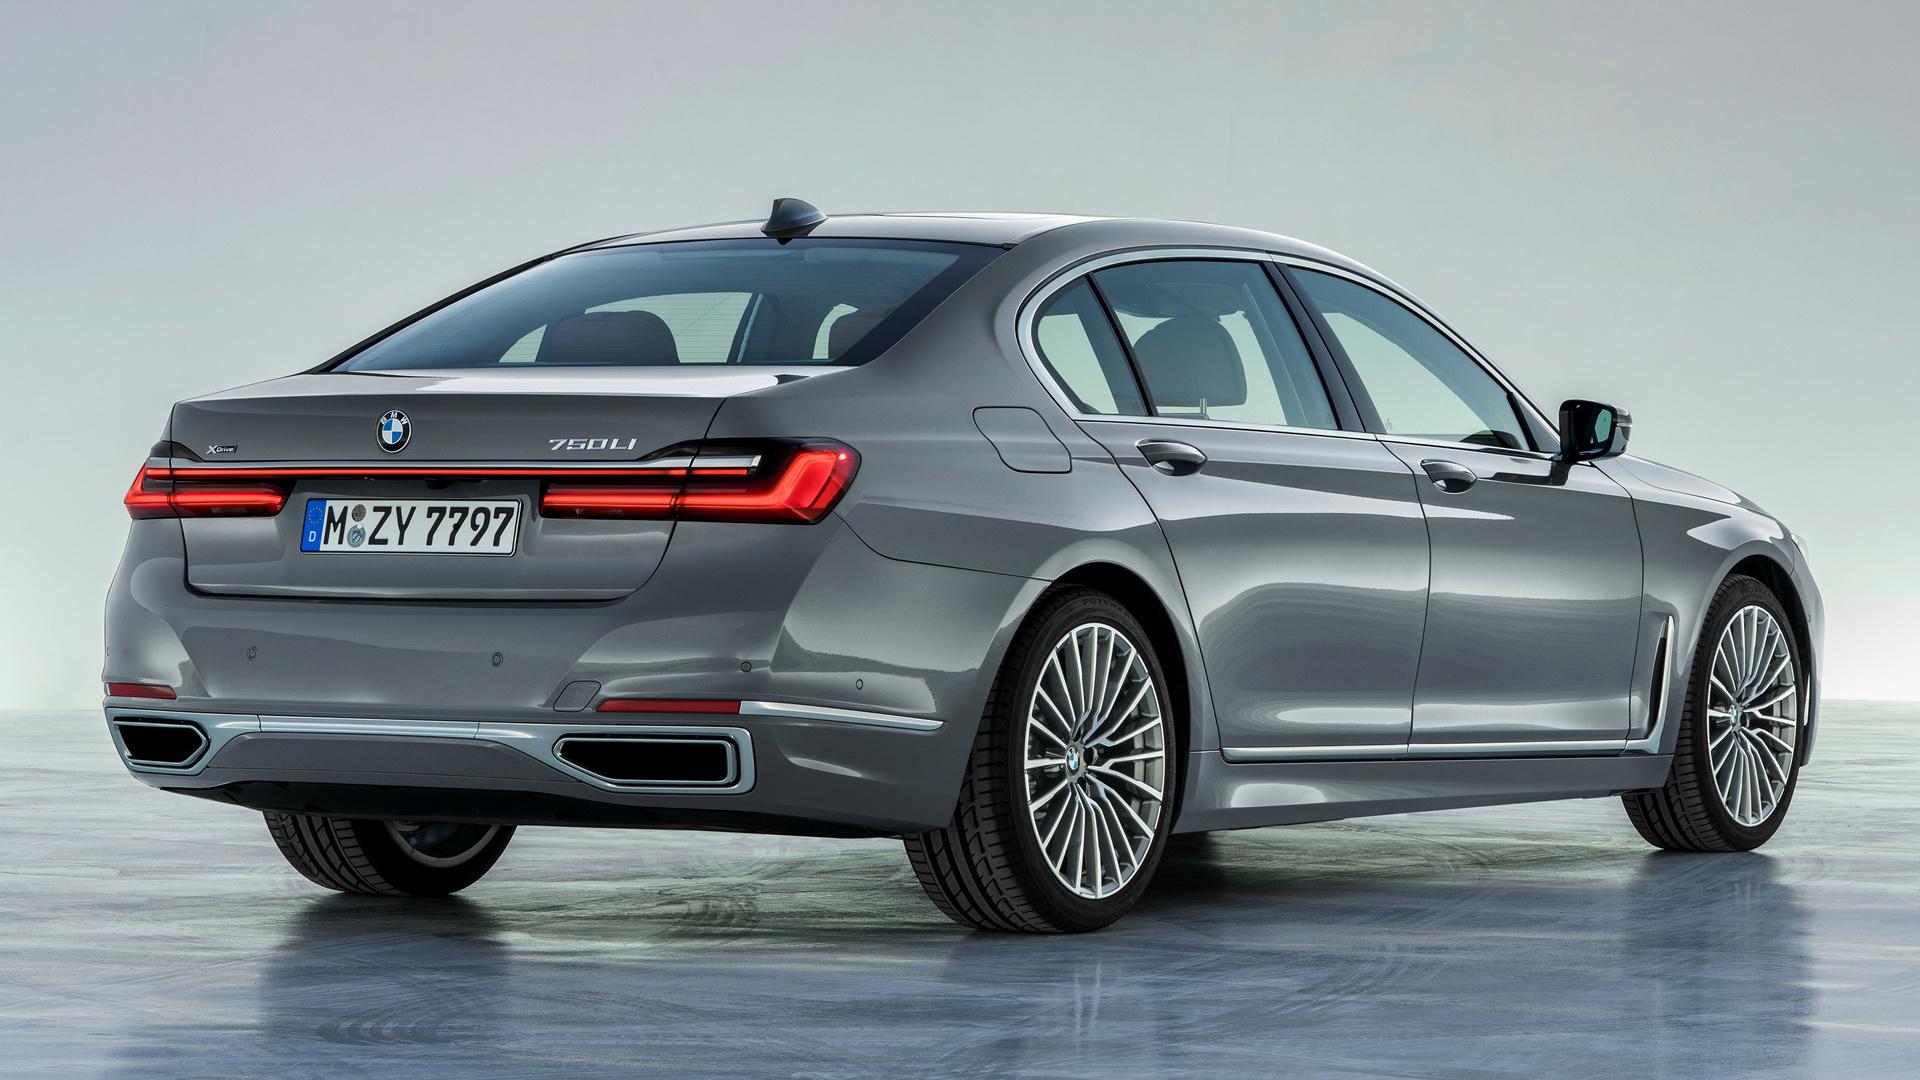 2012 BMW 750Li >> 2019 BMW 7 Series [LWB] - Wallpapers and HD Images | Car Pixel